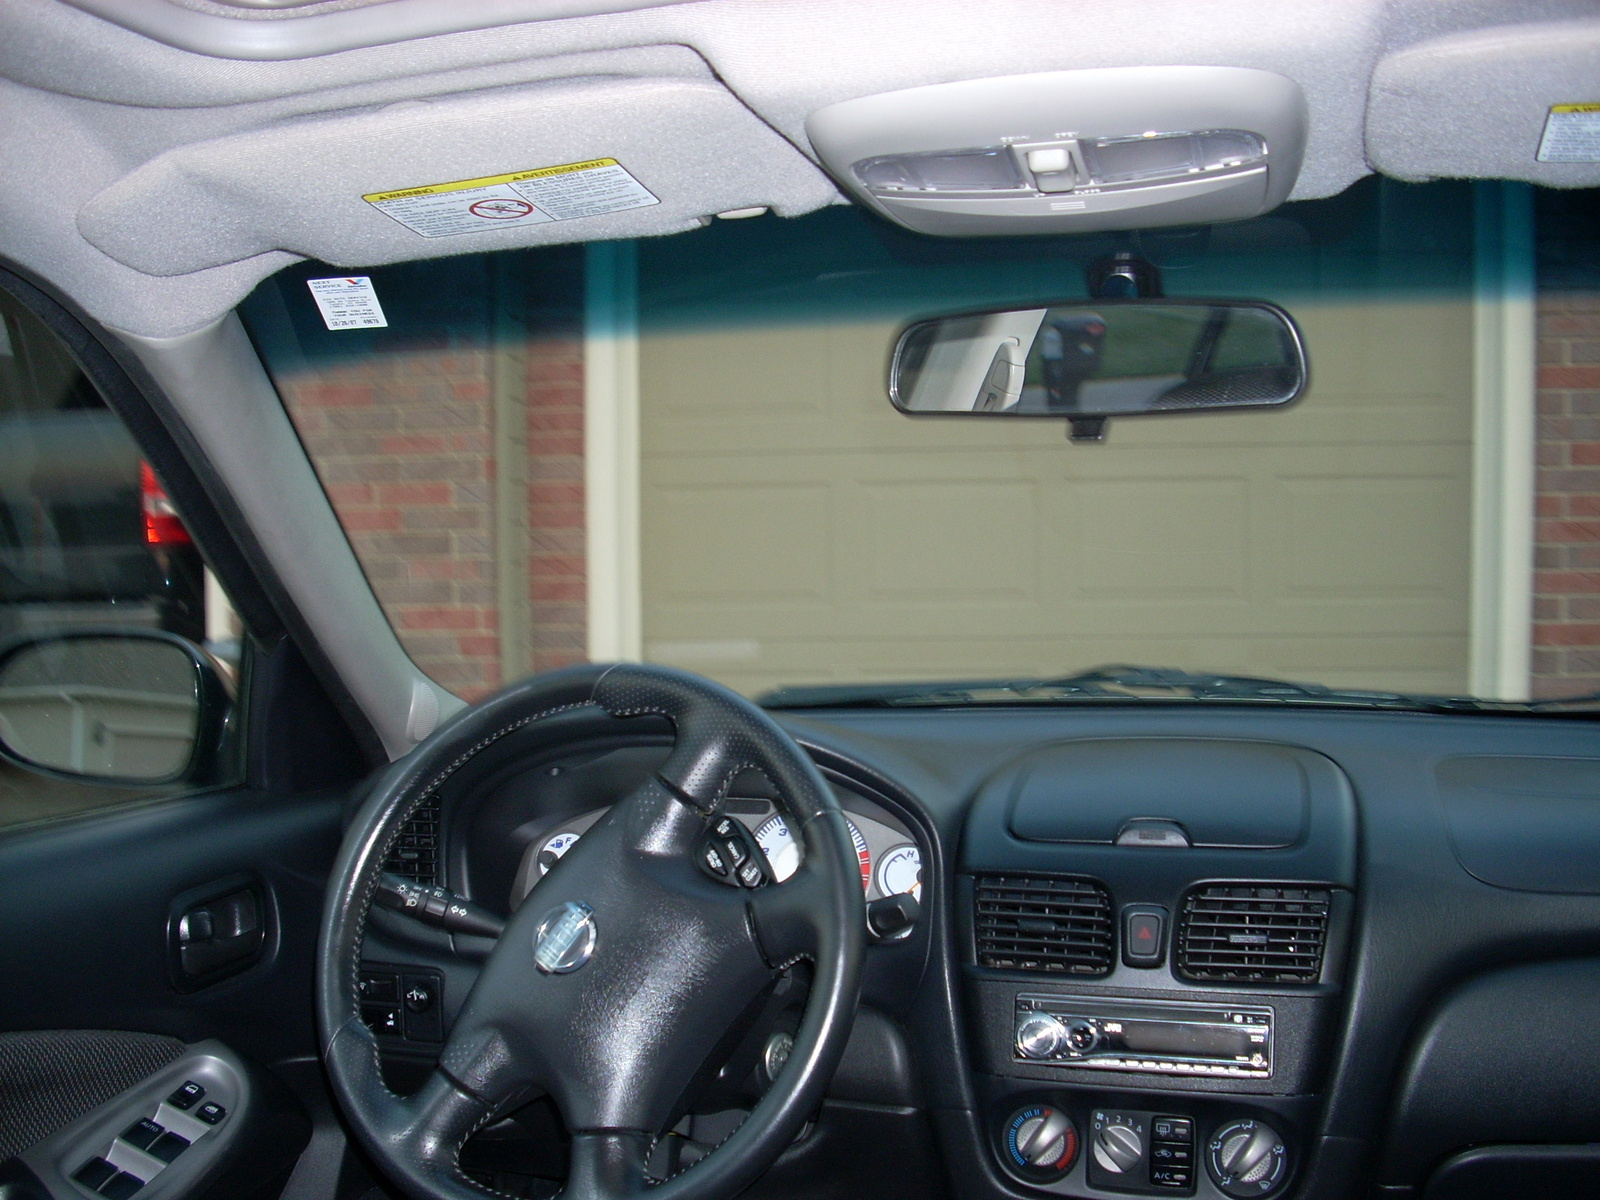 2003 nissan sentra interior choice image hd cars wallpaper 2003 nissan sentra interior pictures to pin on pinterest pinsdaddy 2003 nissan sentra interior vanachro choice vanachro Image collections